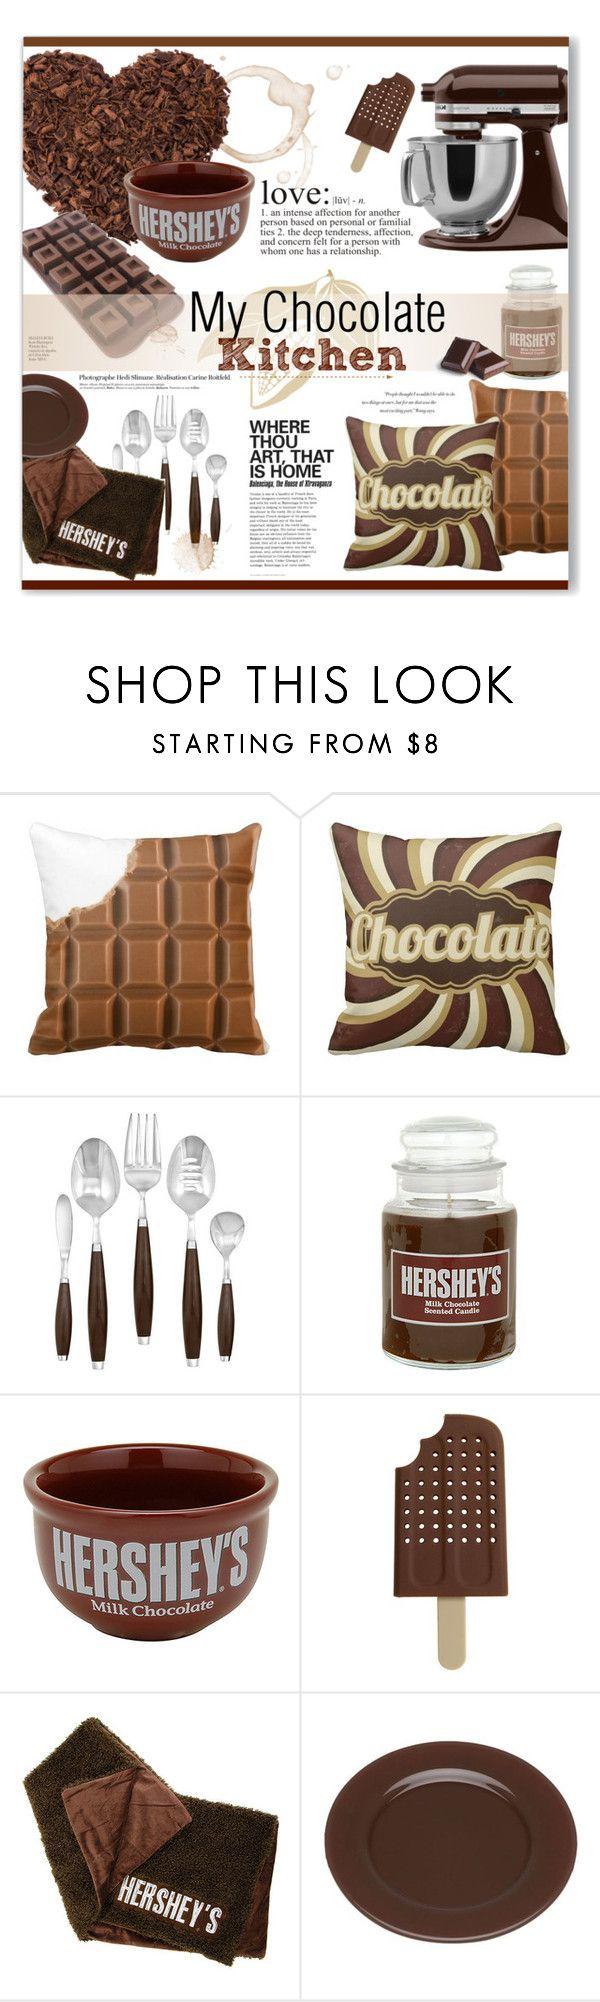 19 best Chocolate decor images on Pinterest   Hershey chocolate ...